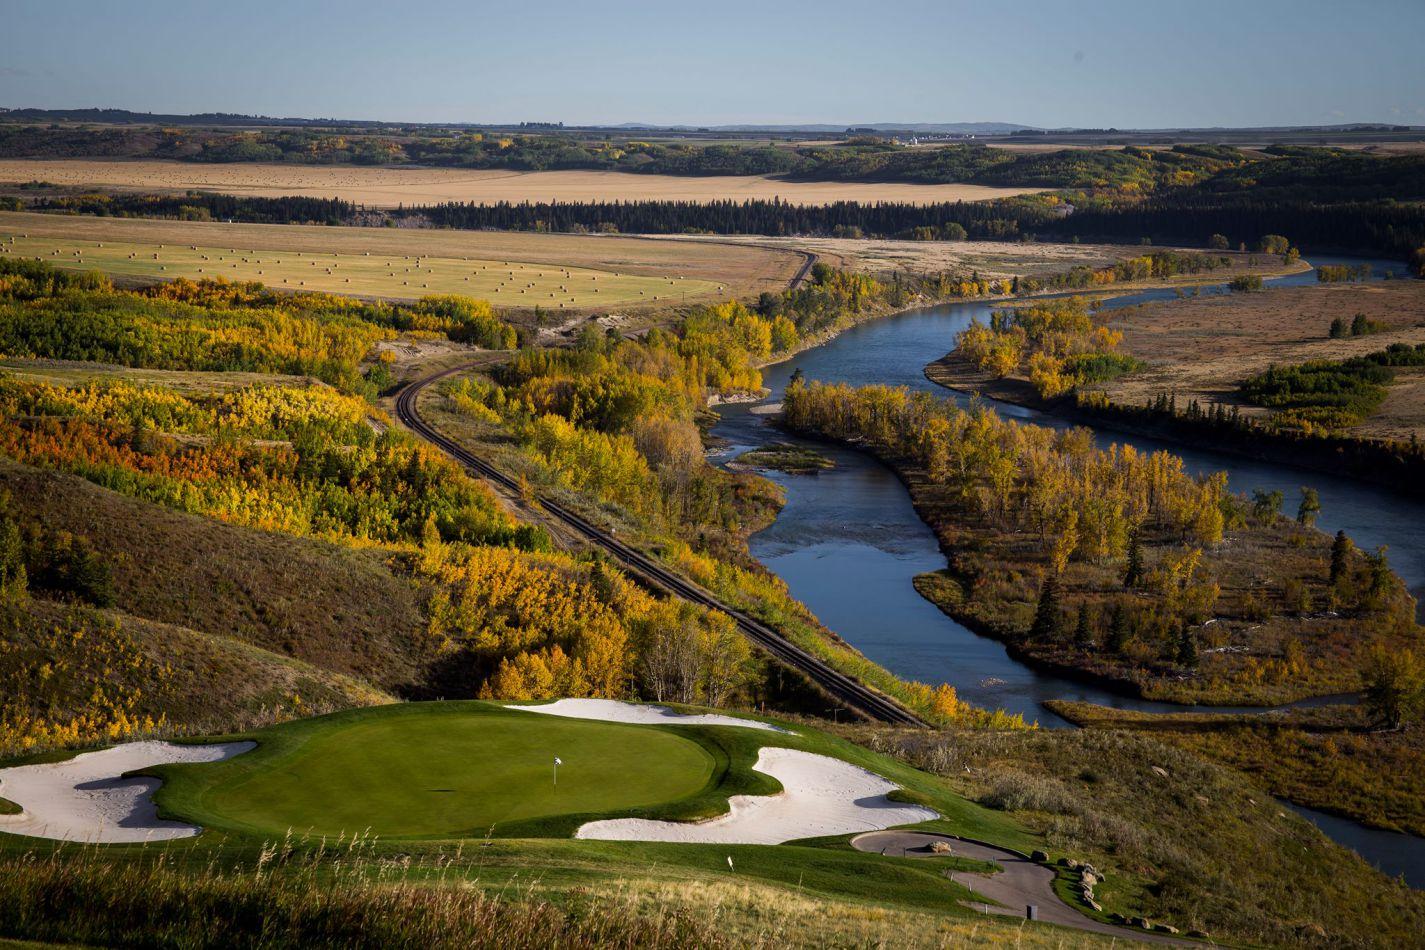 links-of-gleneagles-golf-club-20